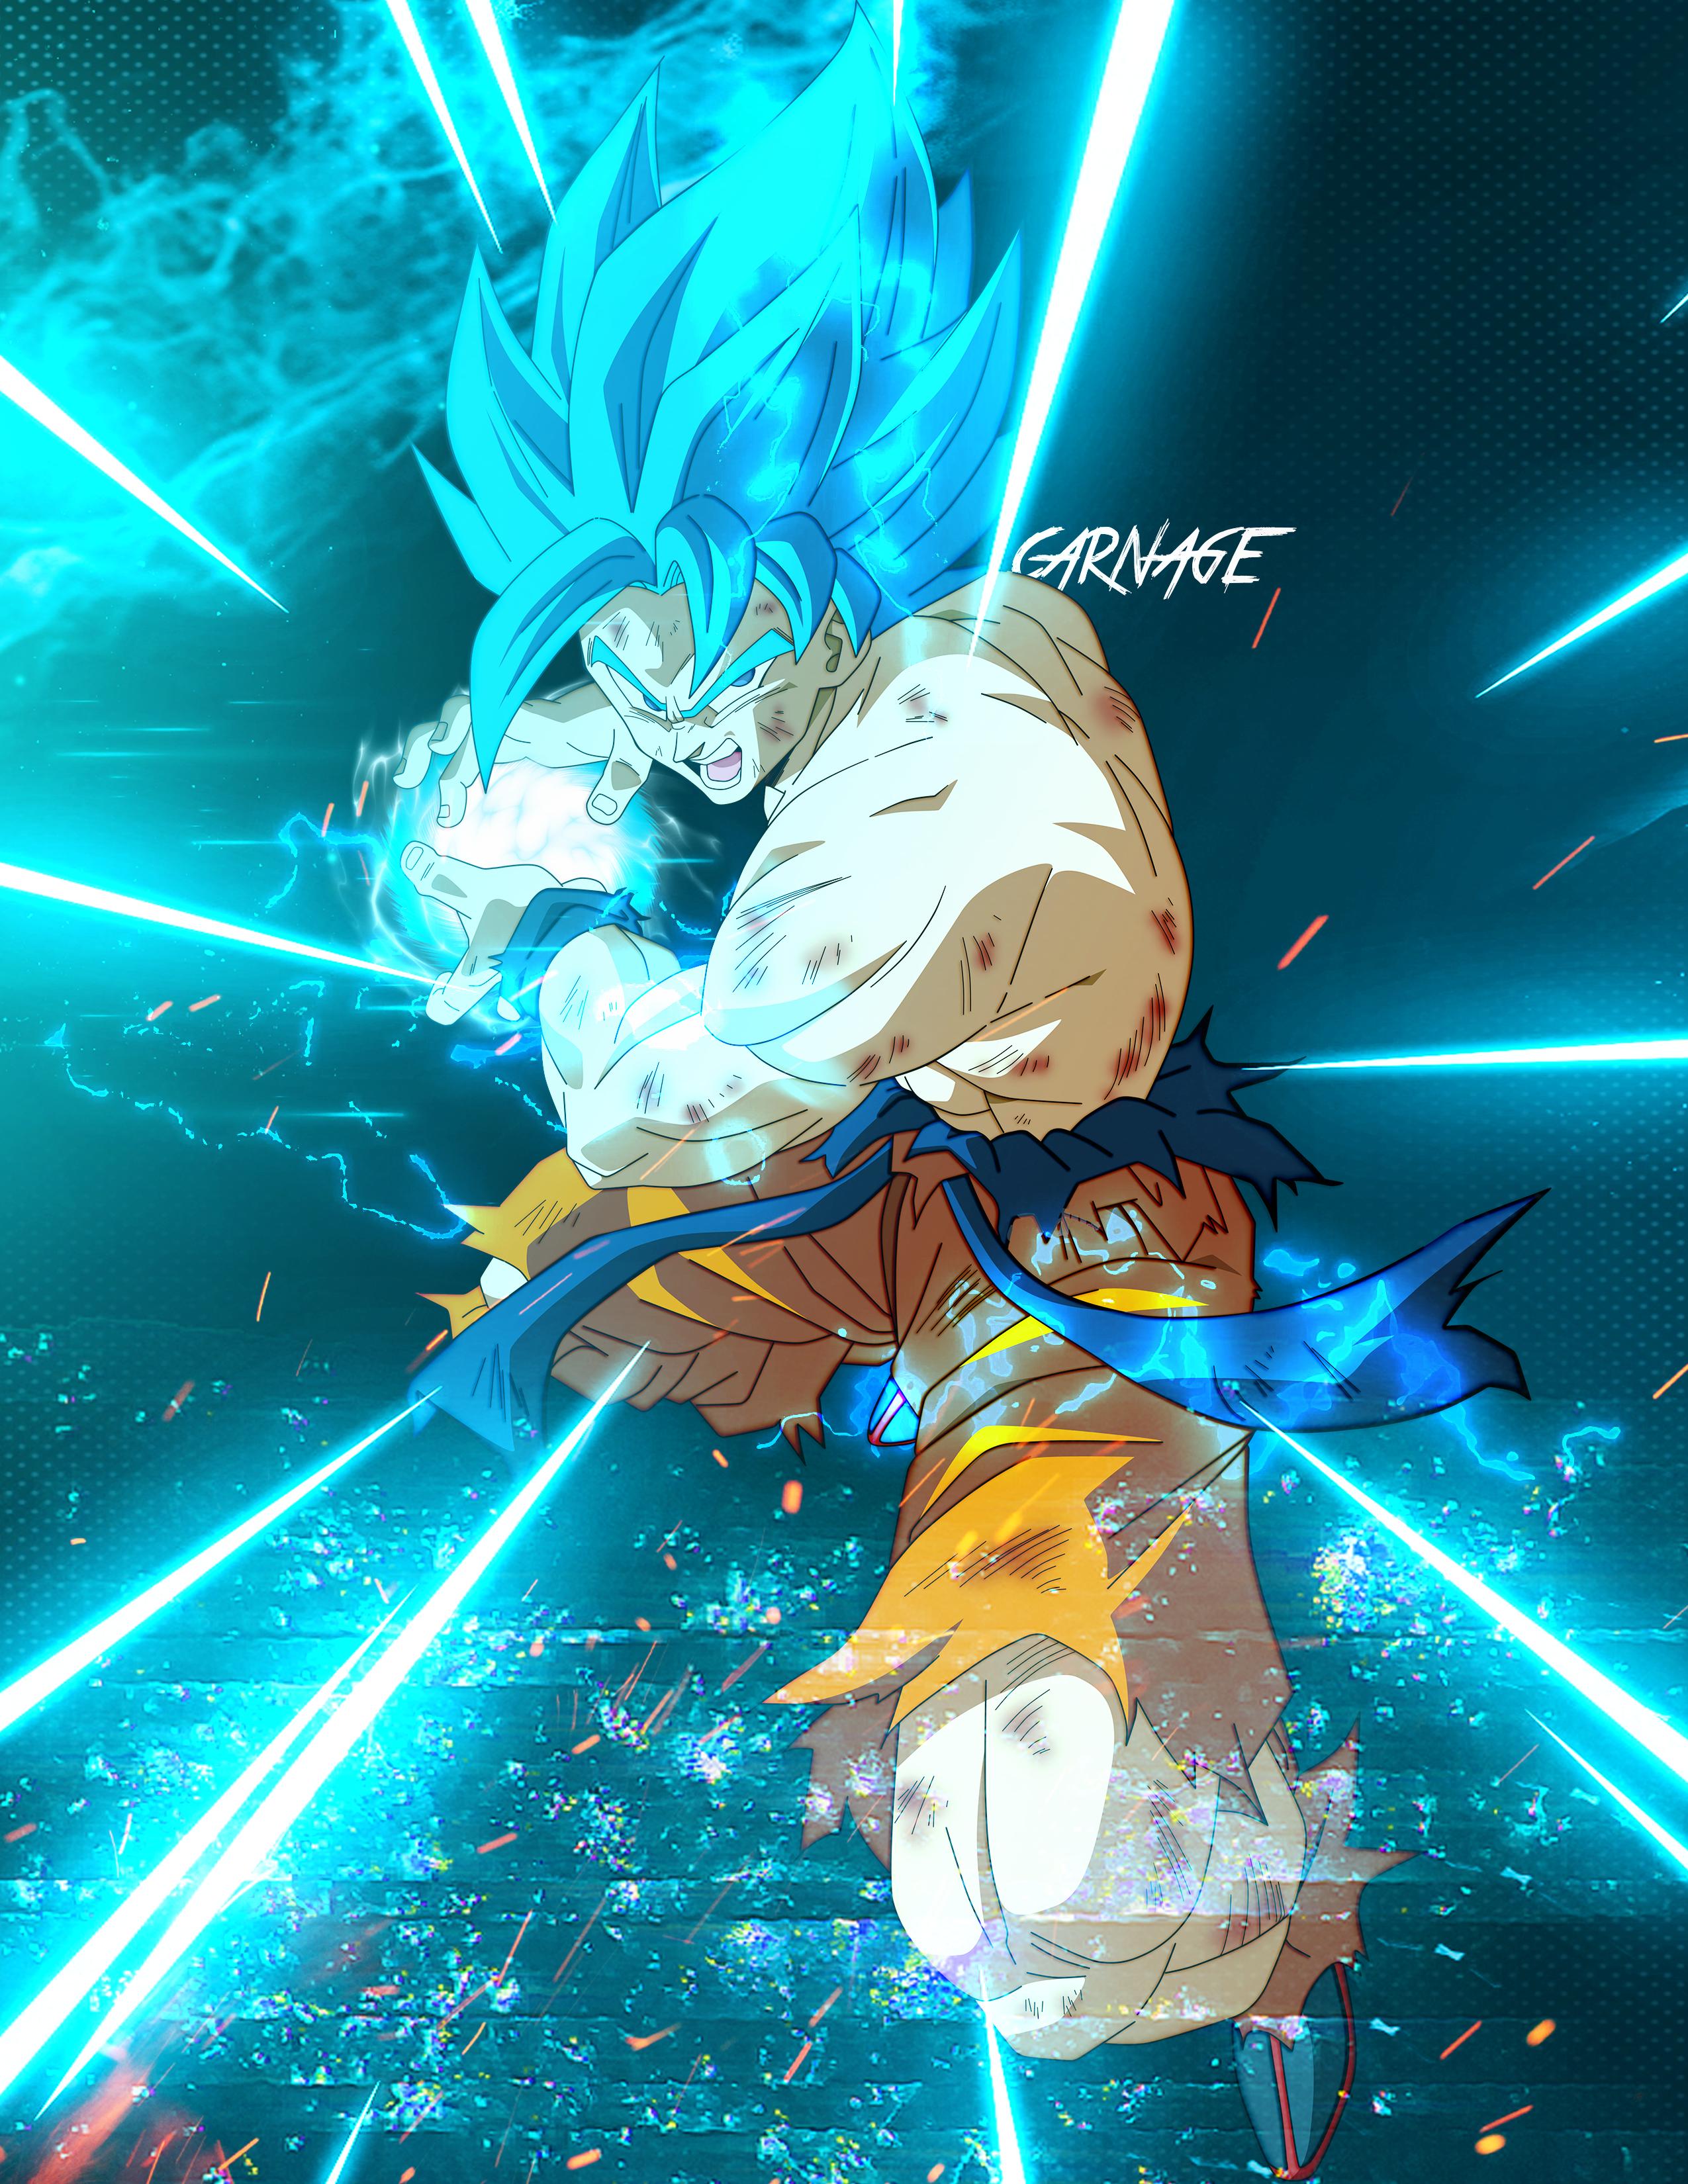 Goku SSGSS - Kamehameha, Dragon Ball Super (With images ...